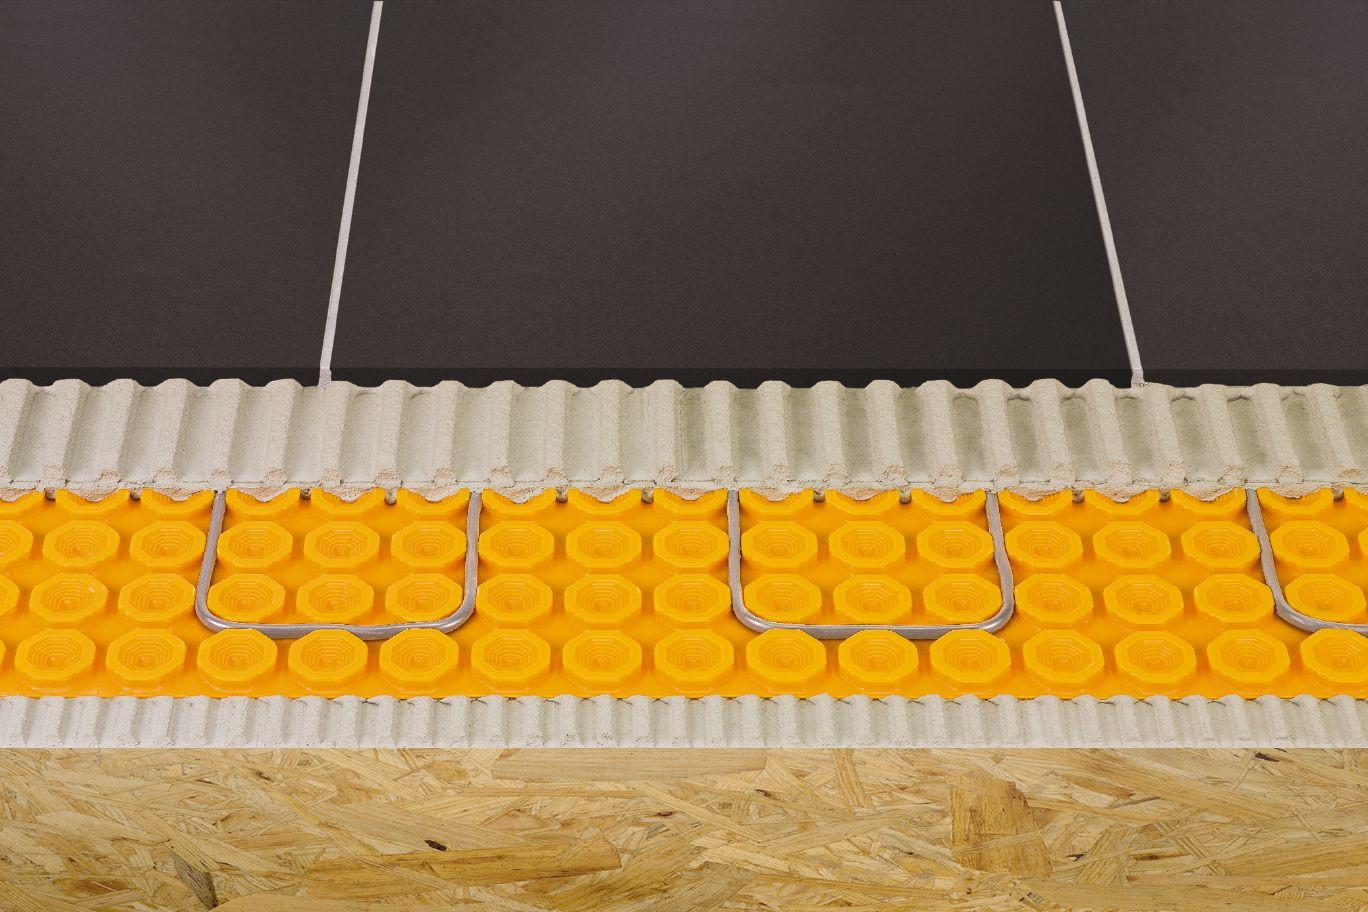 hardwood floor stairs installation video of schlutera ditra heat floor warming schluter ca throughout schlutera ditra heat